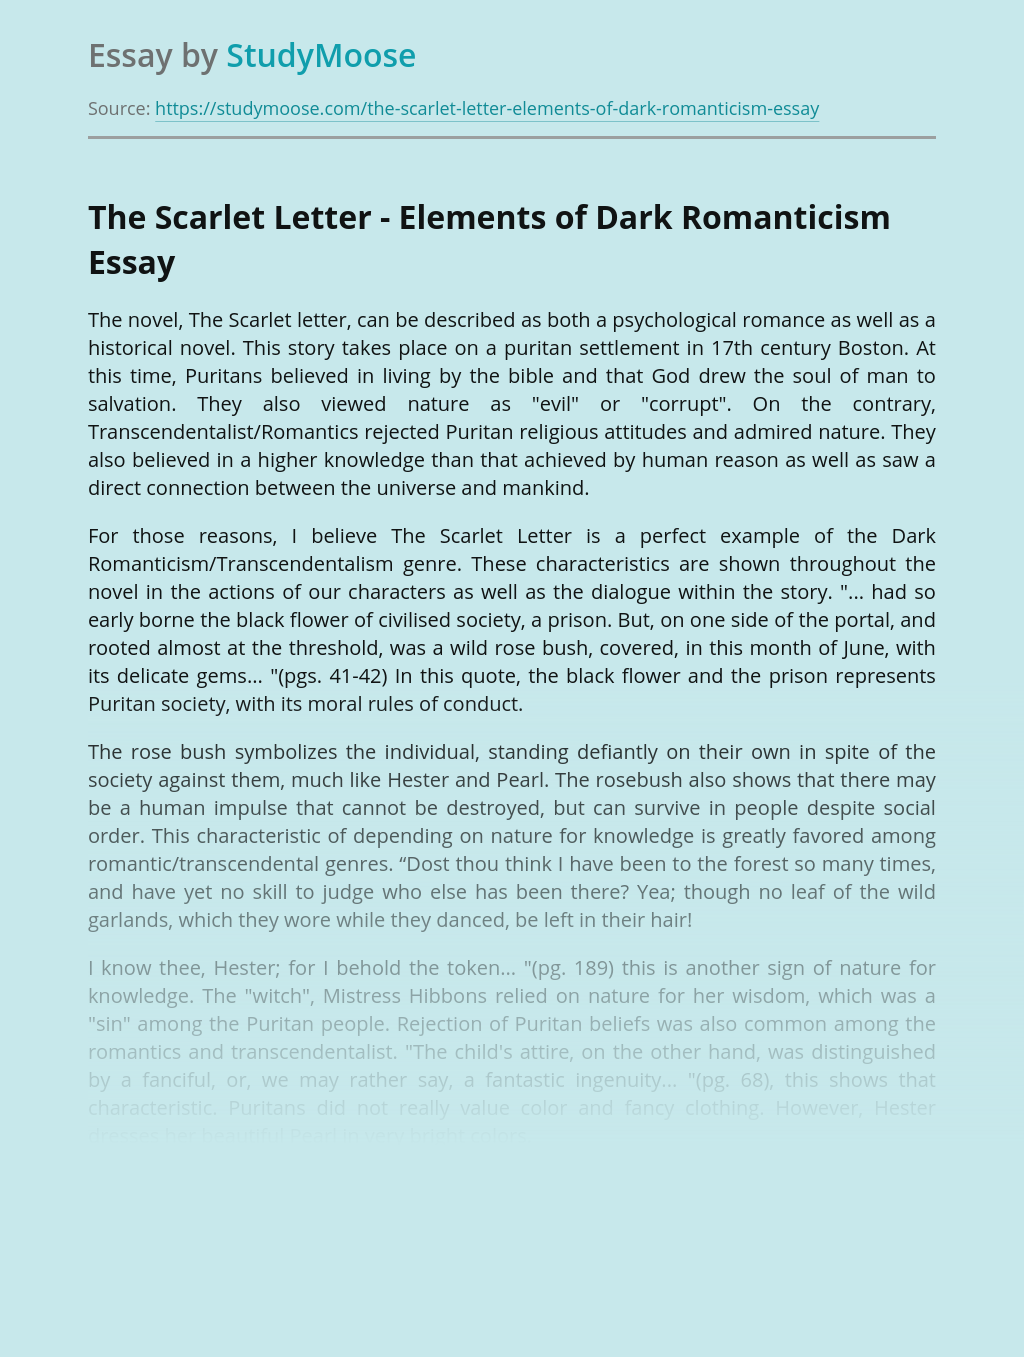 The Scarlet Letter - Elements of Dark Romanticism